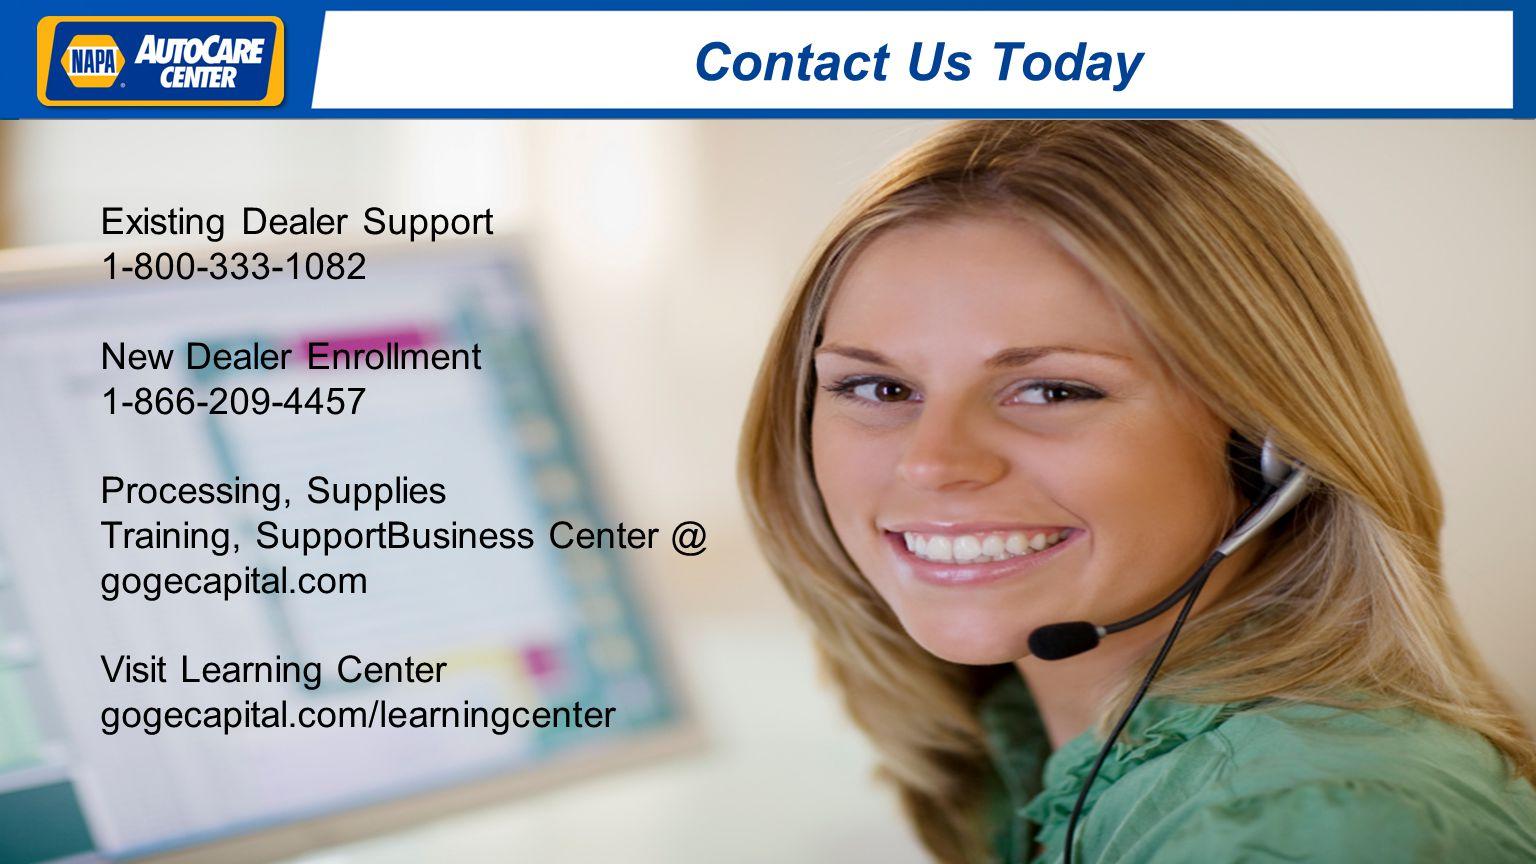 Contact Us Today Existing Dealer Support 1-800-333-1082 New Dealer Enrollment 1-866-209-4457 Processing, Supplies Training, SupportBusiness Center @ gogecapital.com Visit Learning Center gogecapital.com/learningcenter